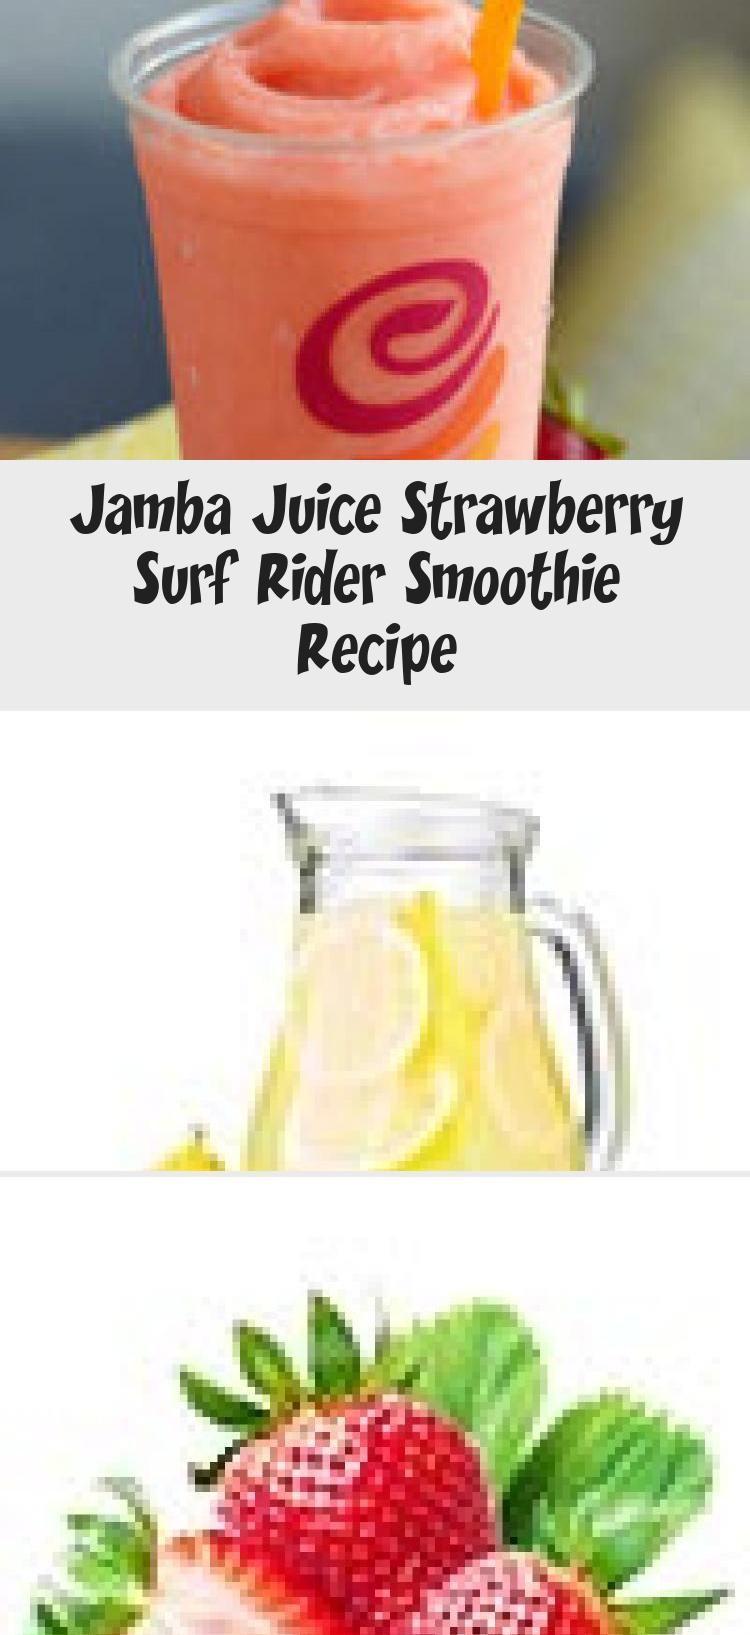 En Blog En Blog In 2020 Watermelon Smoothies Jamba Juice Recipes Jamba Juice